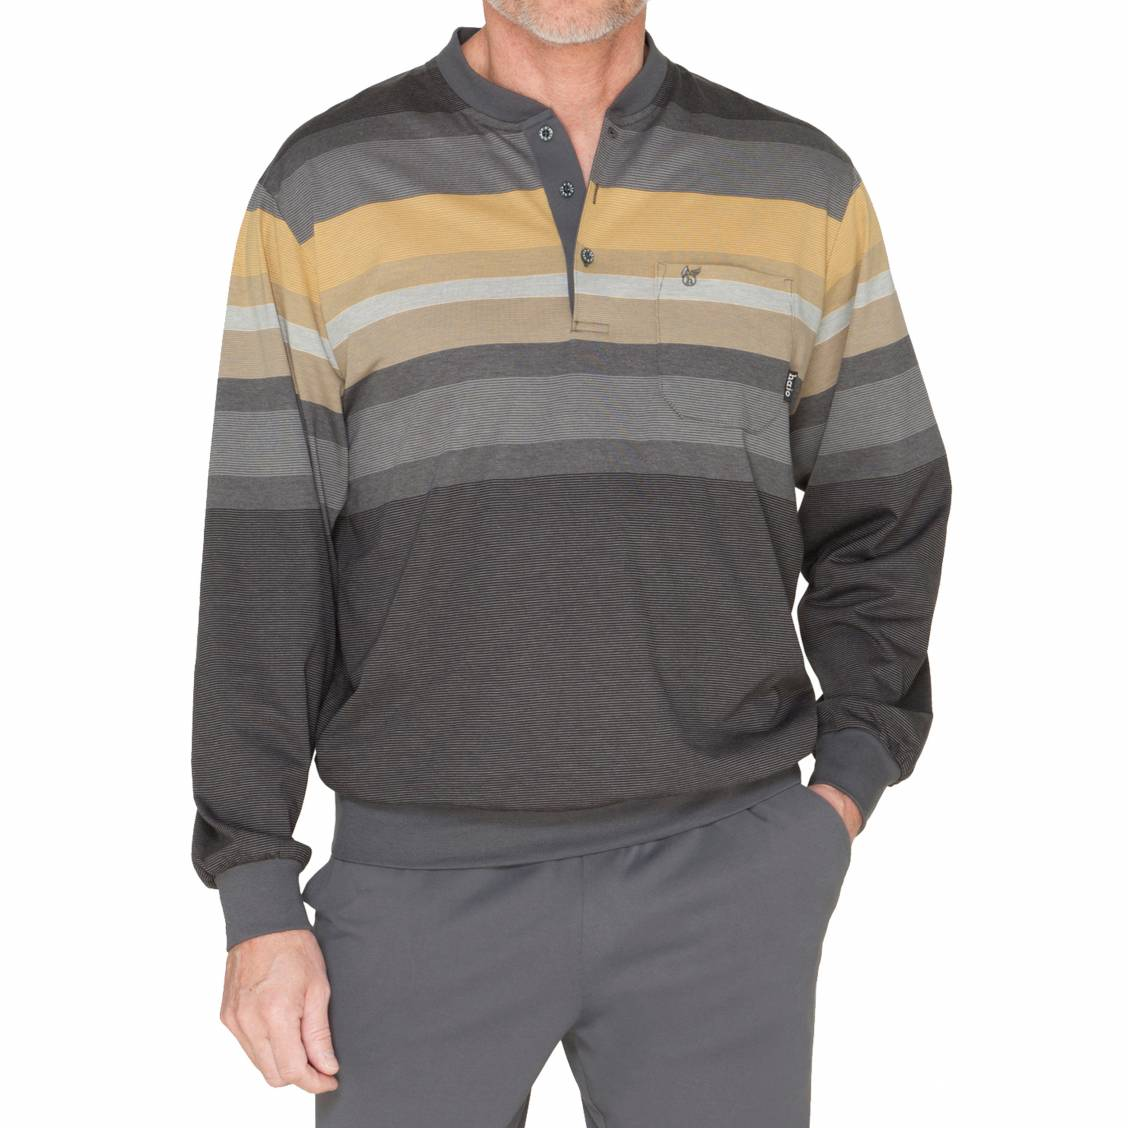 Pyjama long Hajo Confort Climat   tee-shirt manches longues col tunisien à  rayures grises ... 594b5e8226f6